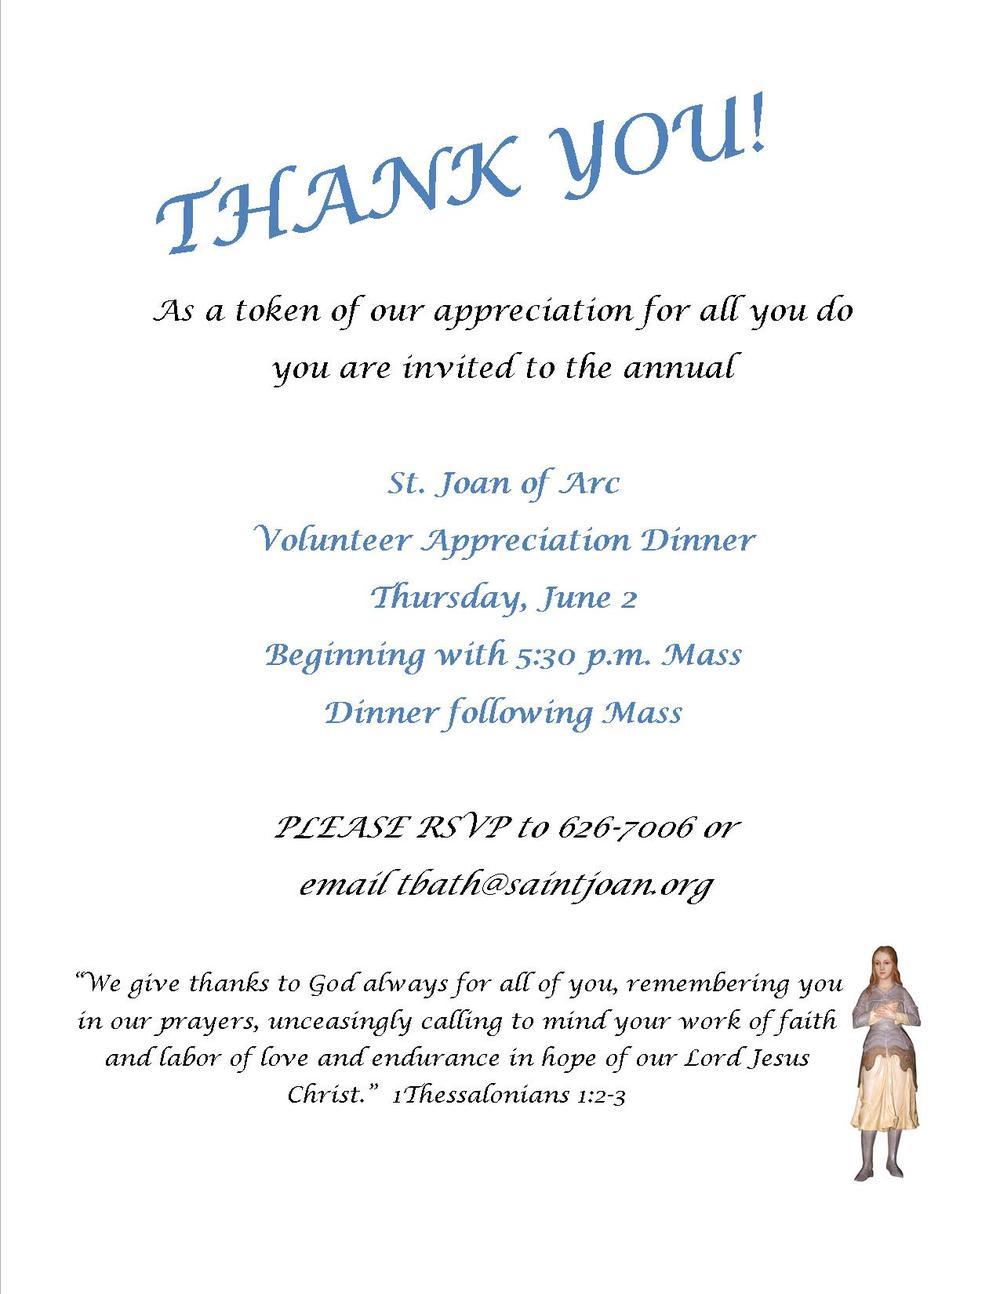 Volunteer Appreciation Dinner Saint Joan of Arc Catholic Church